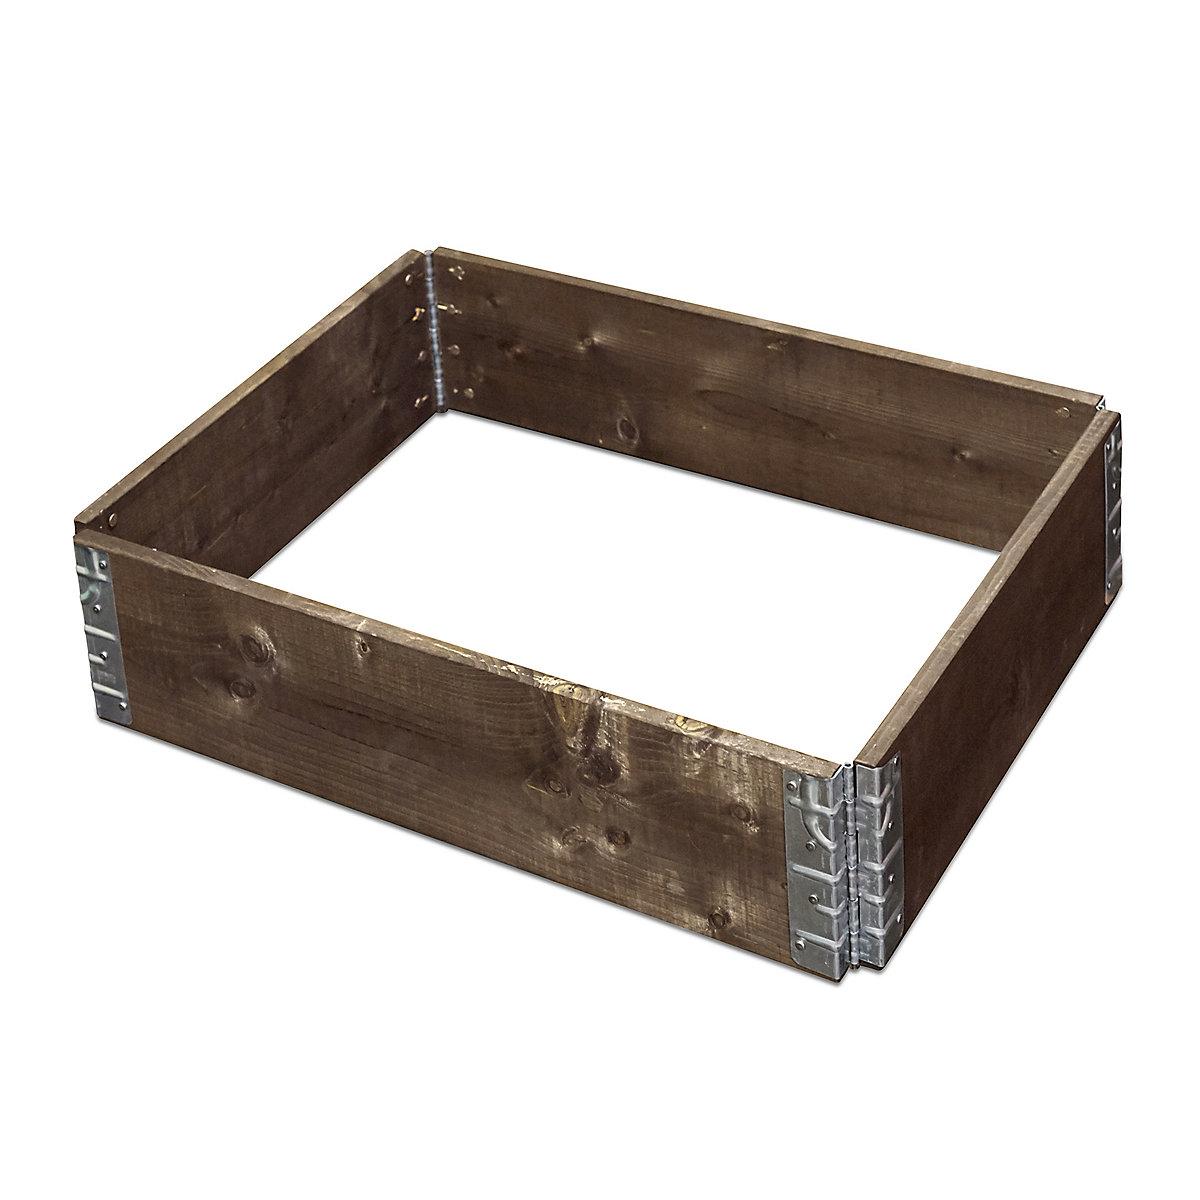 Fichtenholz hochbeet erweiterbar 60x80 cm braun yomonda for Badepool obi